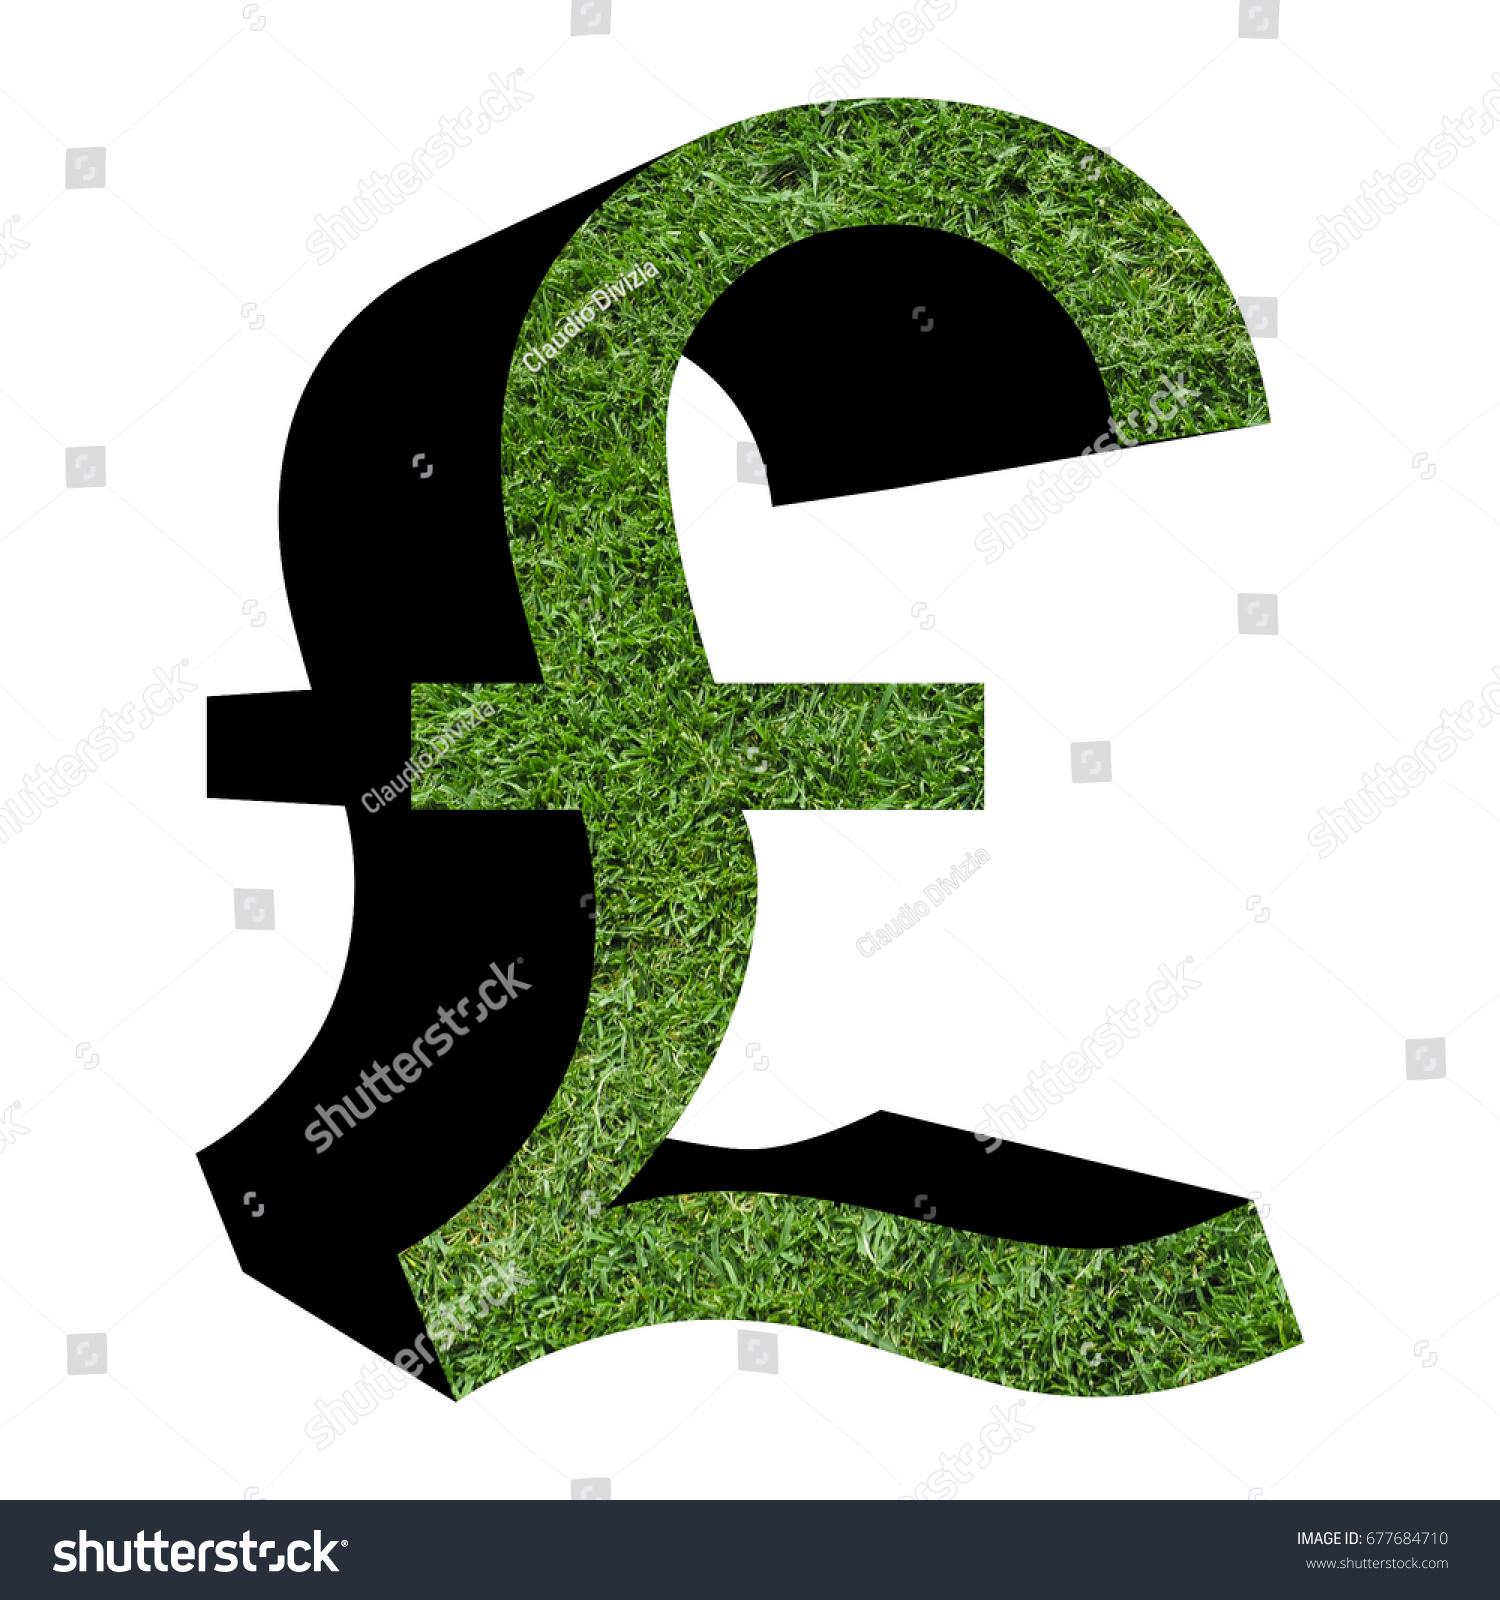 Gbp Uk Pound Symbol Grass Texture Stock Illustration 677684710